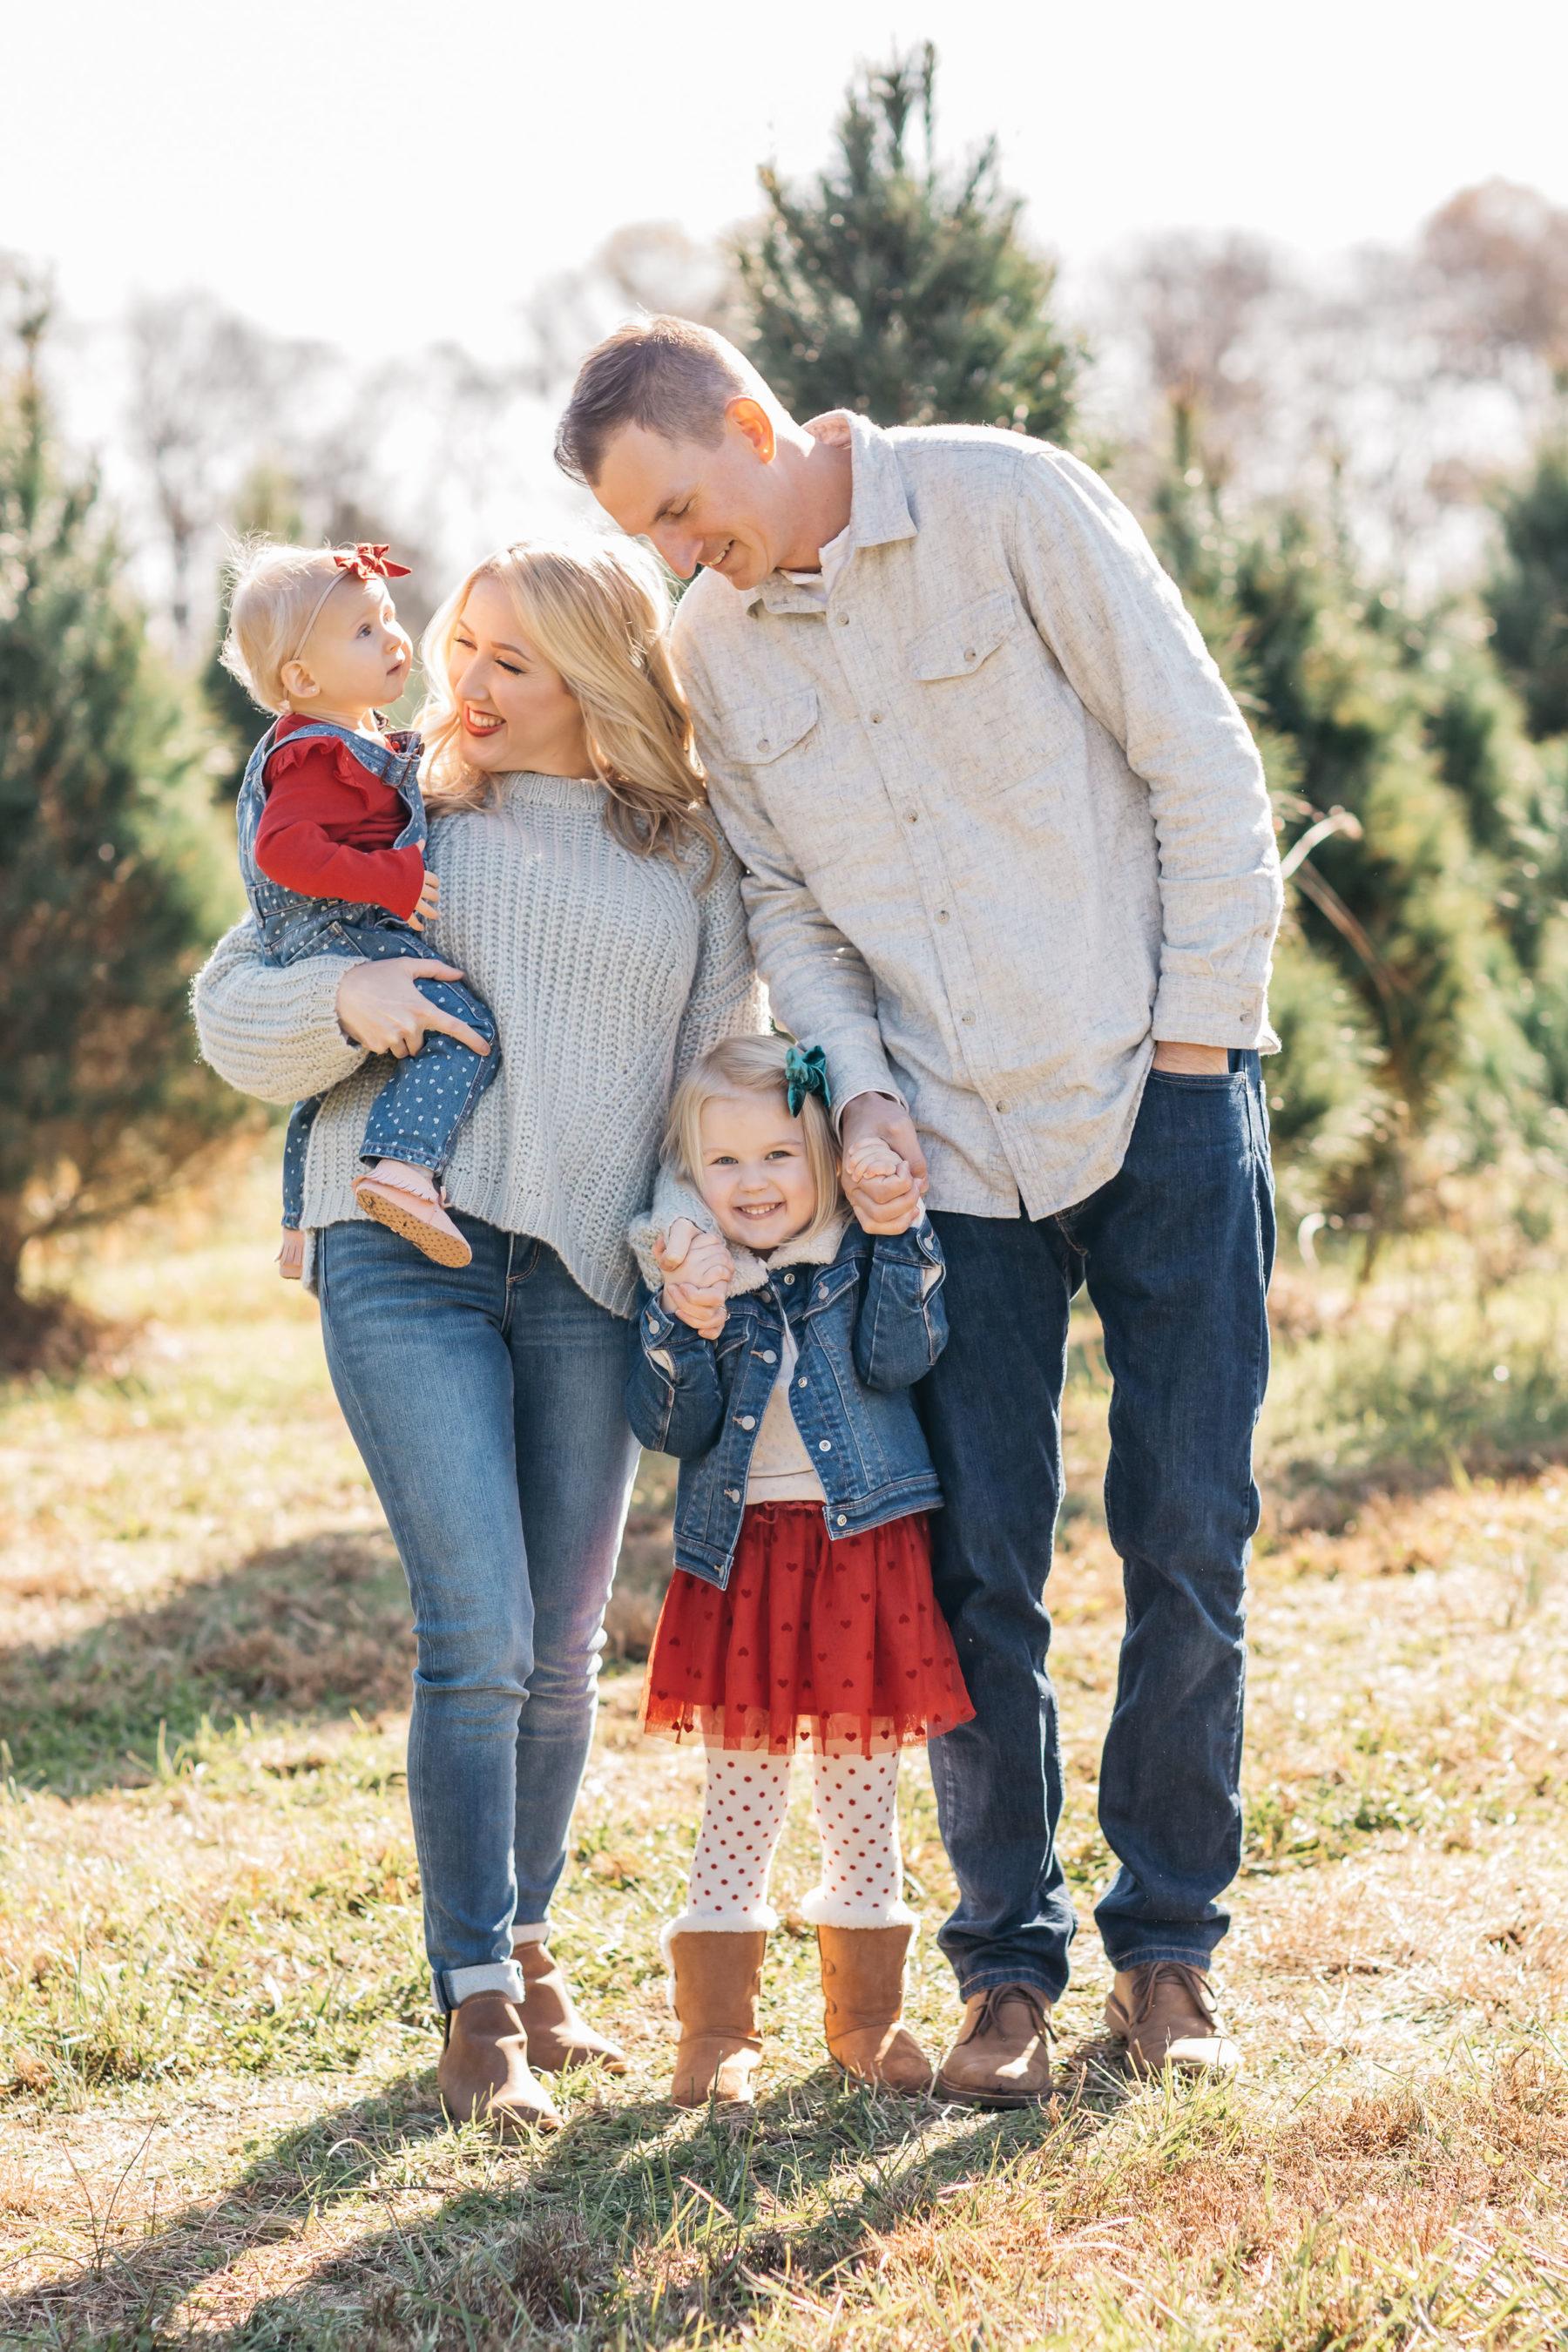 Nashville family photographer featured on Nashville Baby Guide!